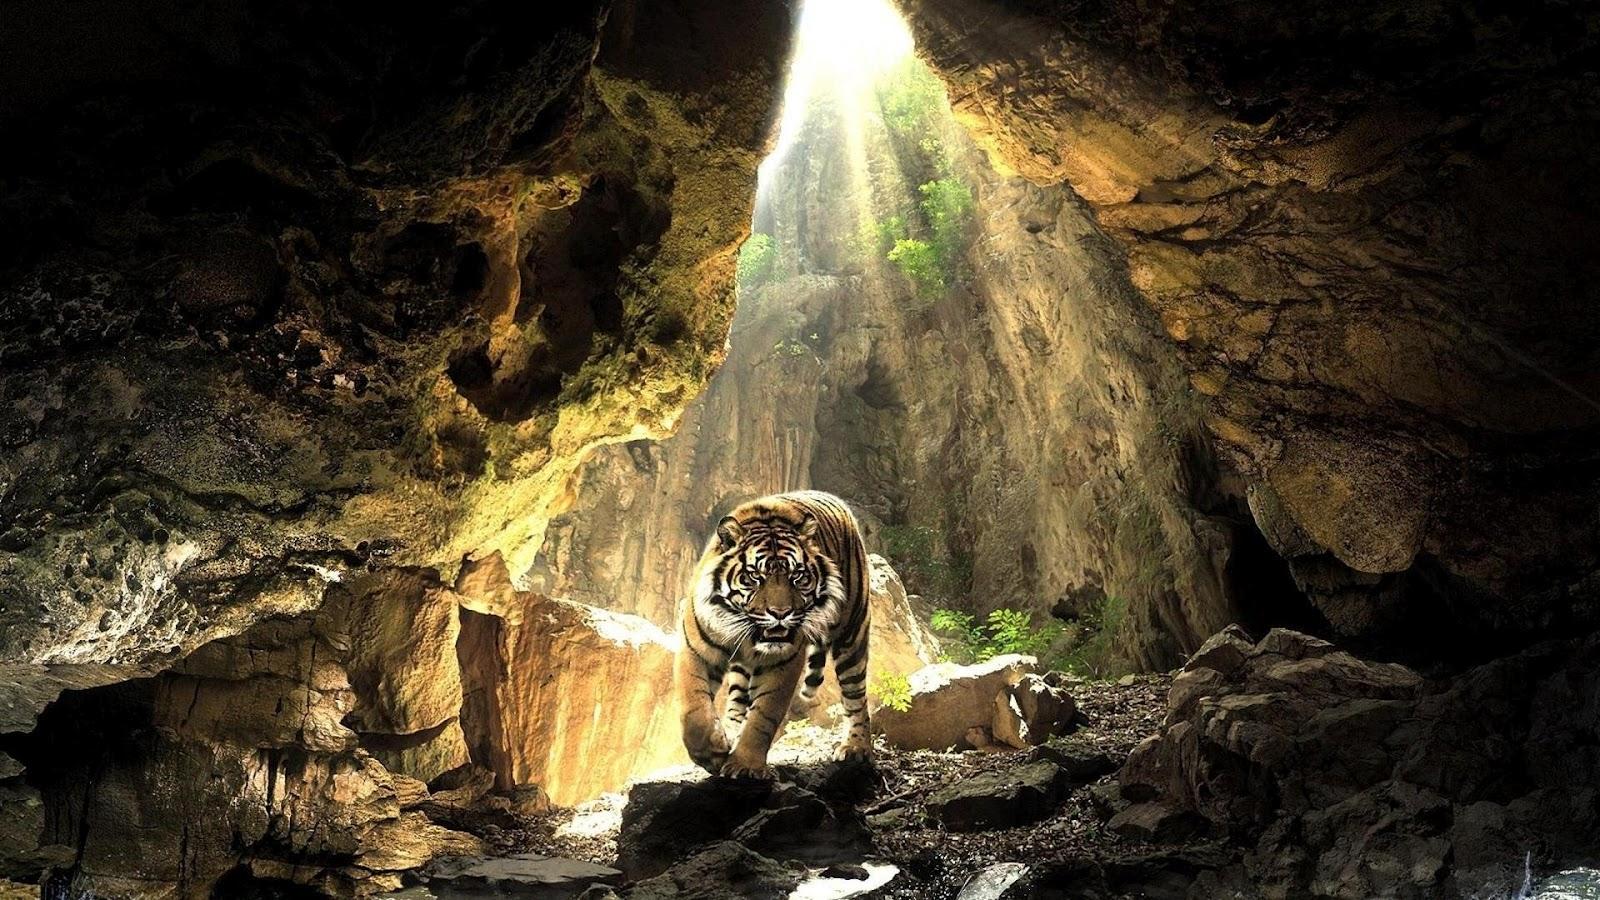 http://2.bp.blogspot.com/-cfvSwD9Mbe0/Tzy_5_NgQBI/AAAAAAAAXOo/xLK1cKnbzH4/s1600/ferocious-tiger-1920x1080.jpg